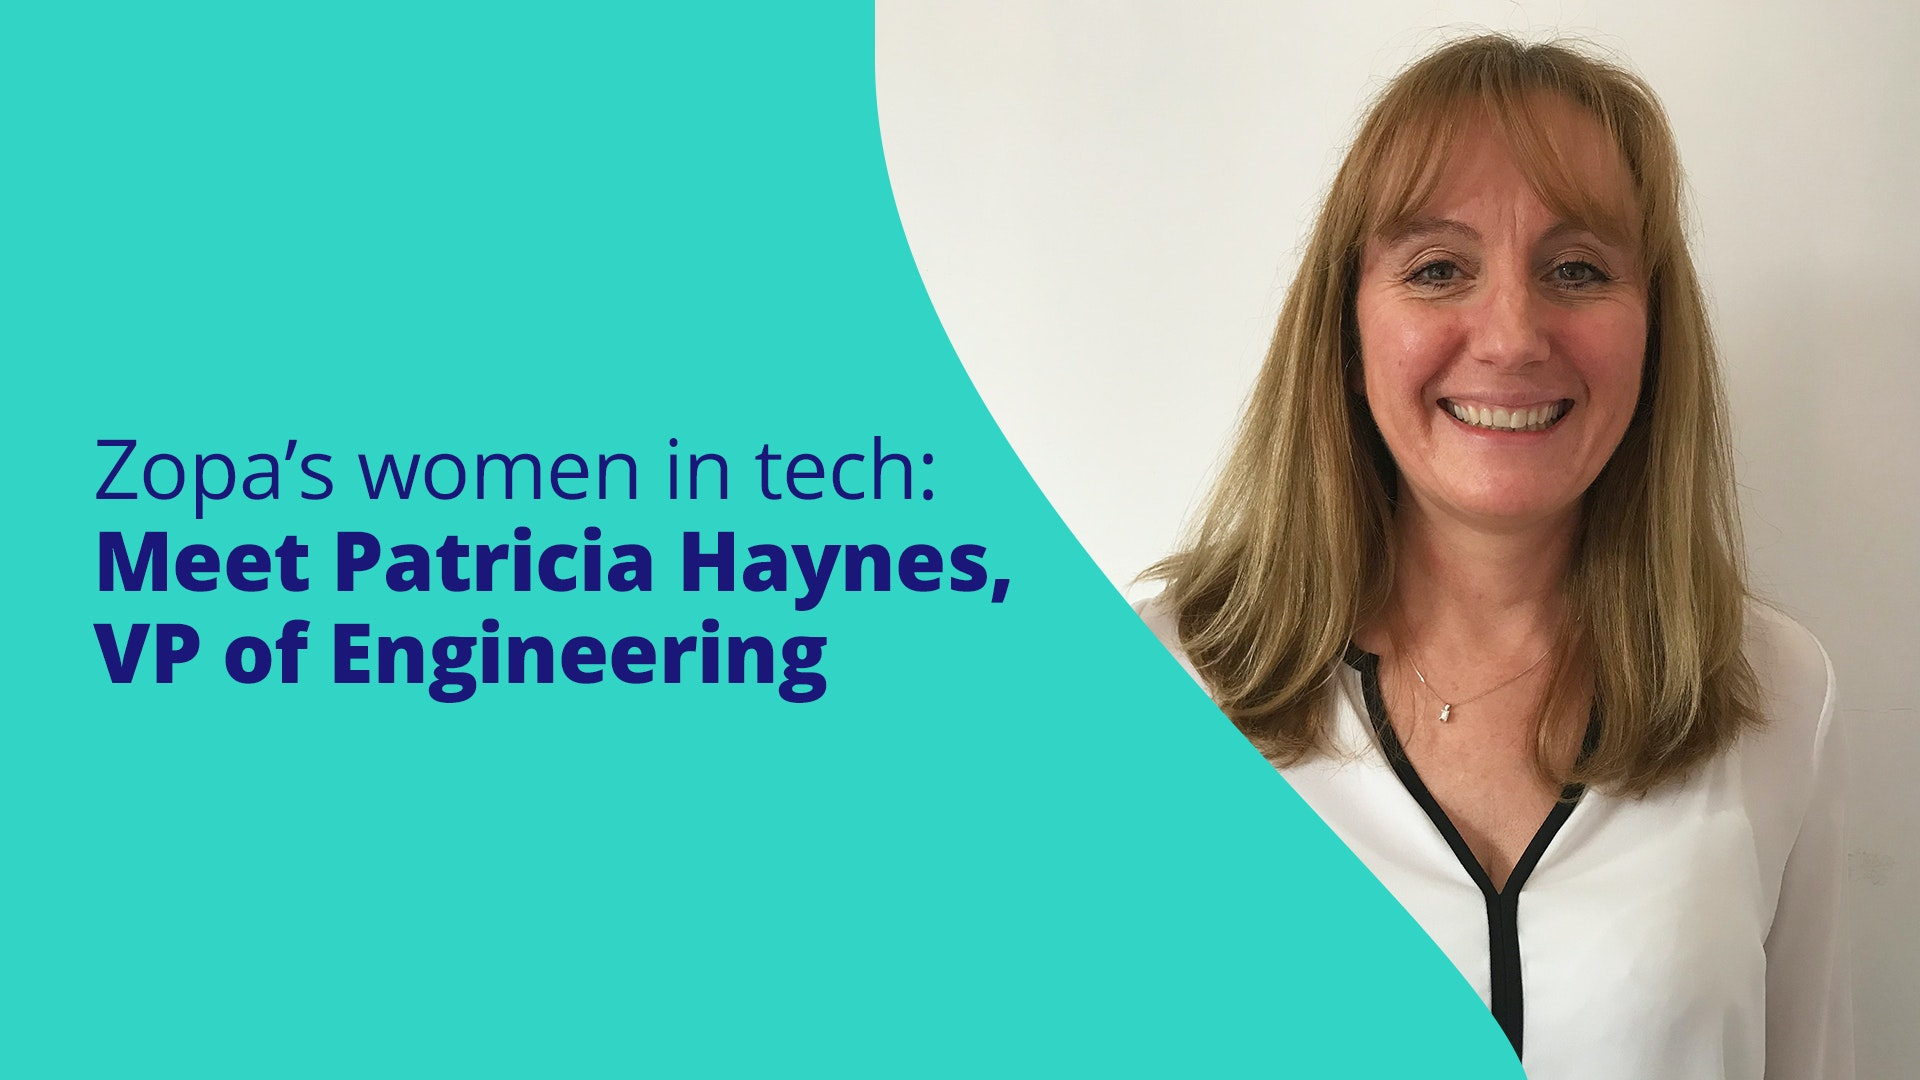 zopa-s-women-in-tech-meet-patricia-haynes-vp-of-engineering